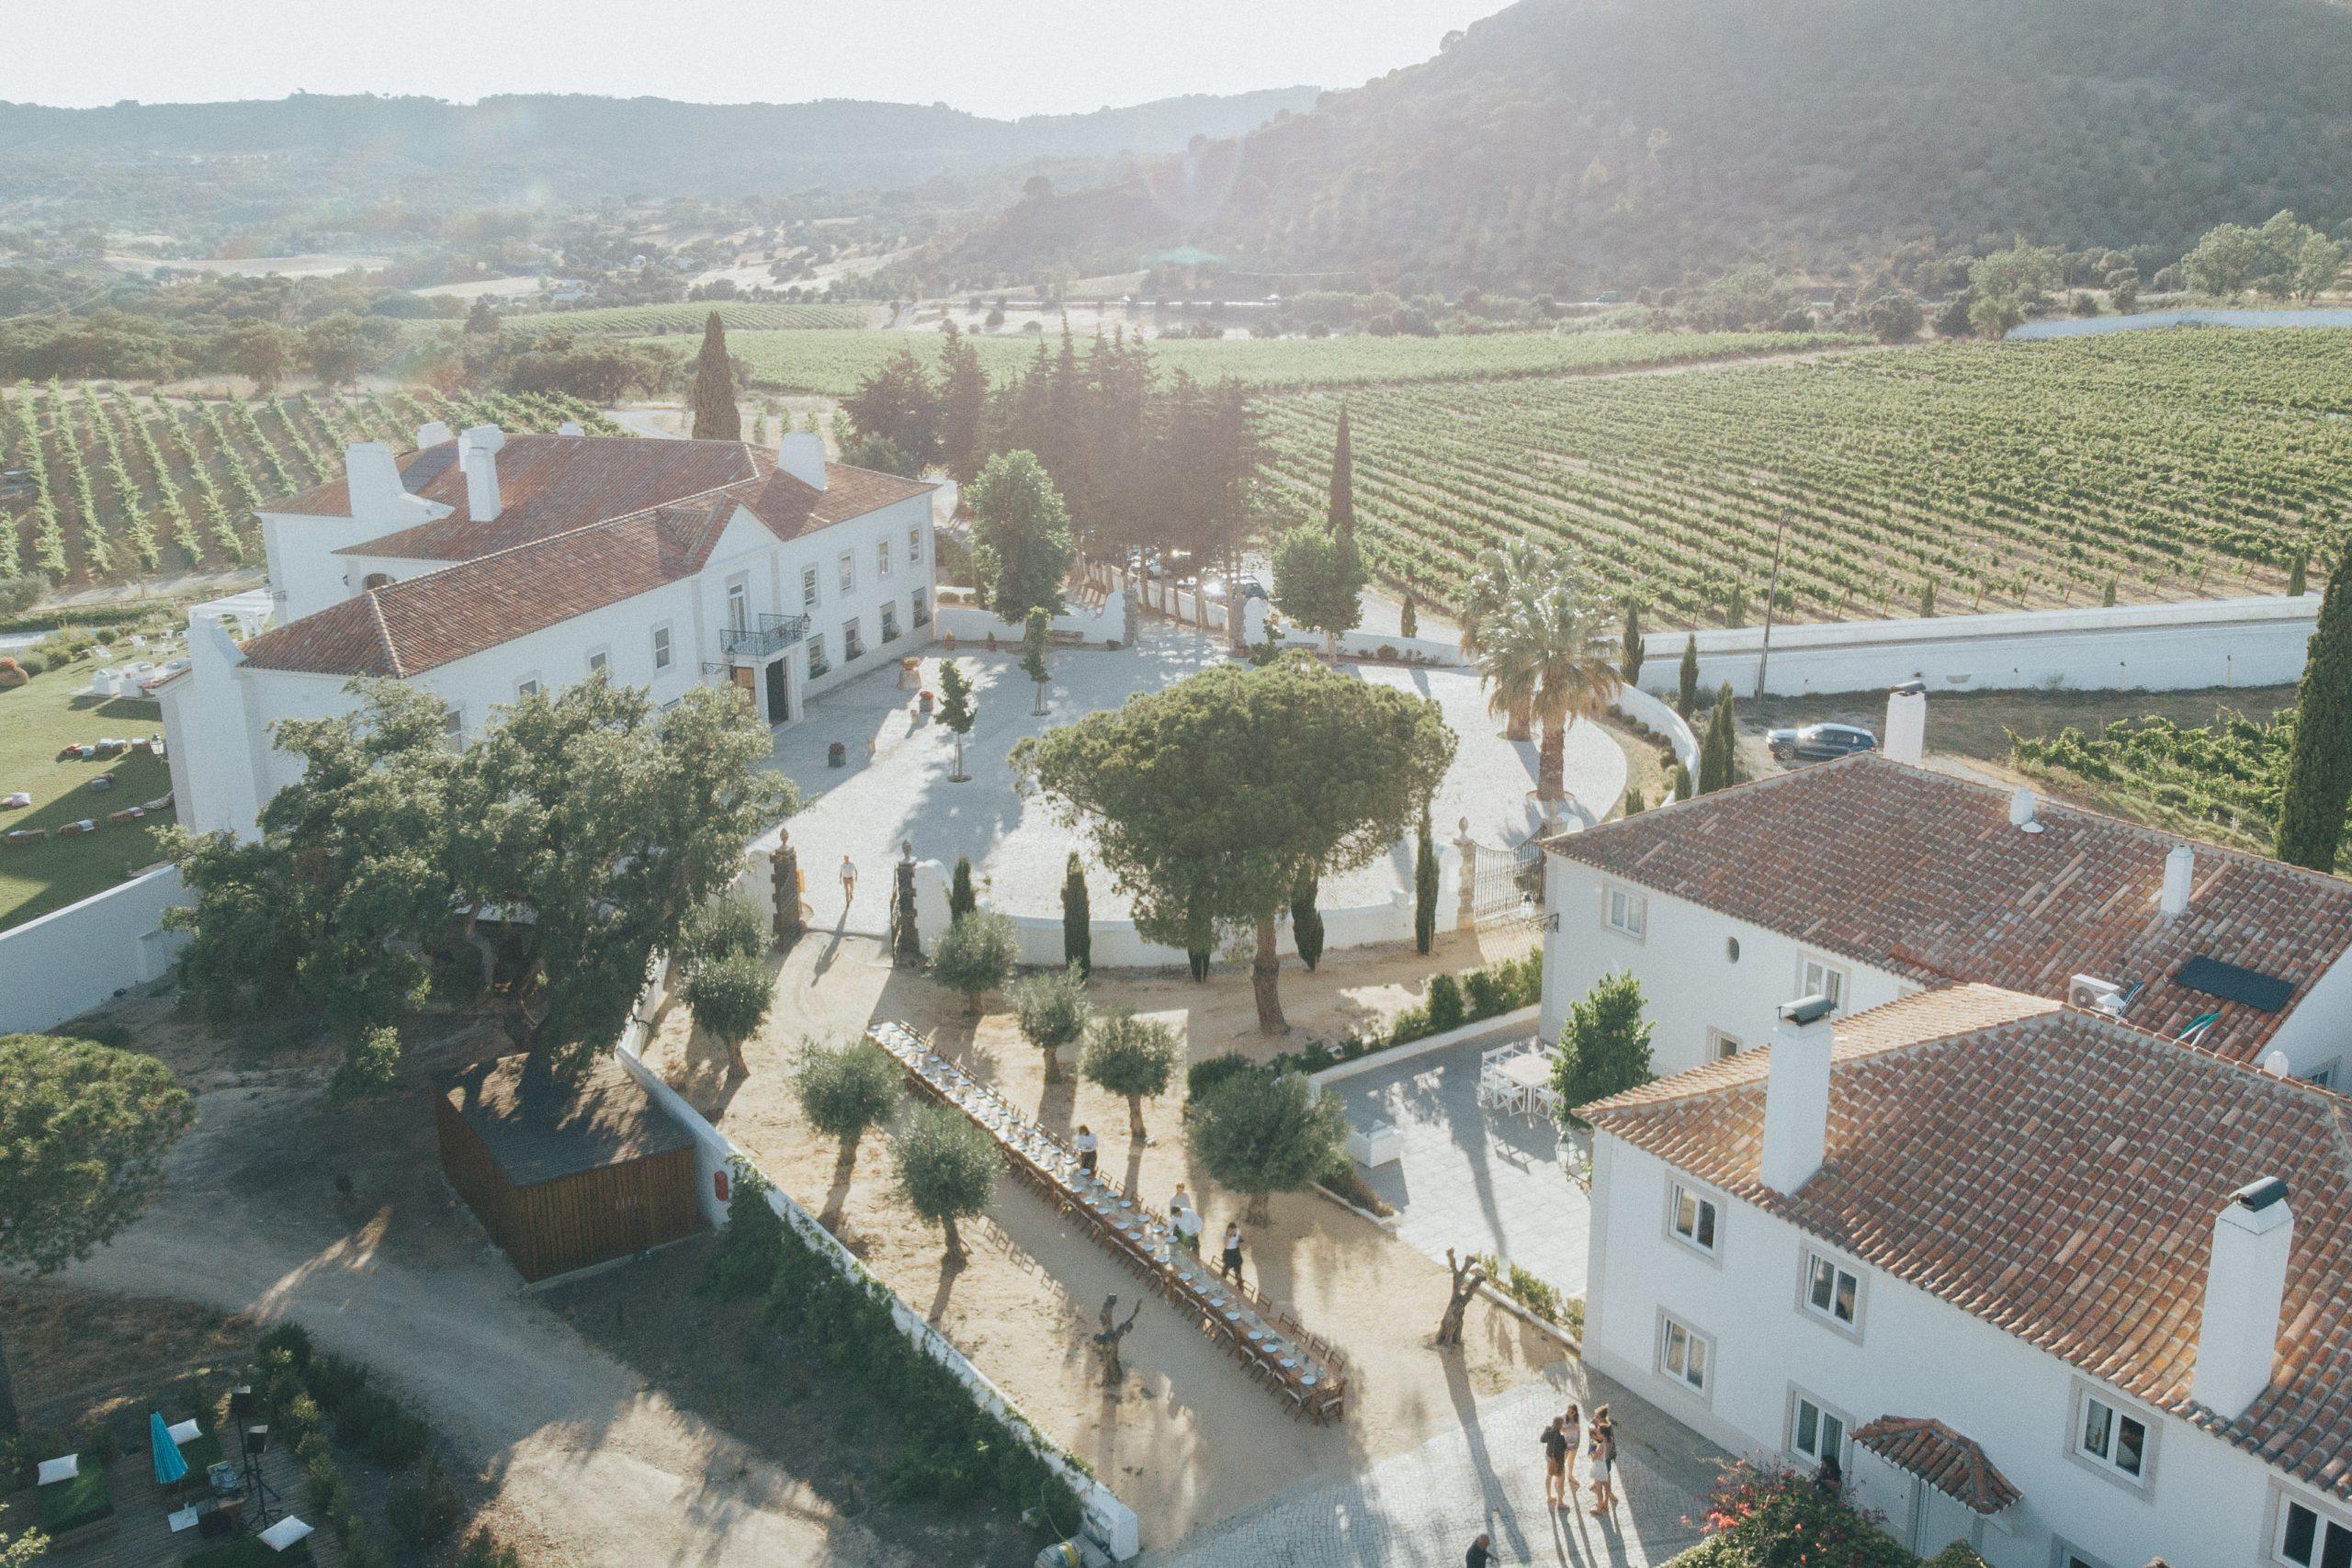 hotel casa pallmela wedding venues portugal countryside